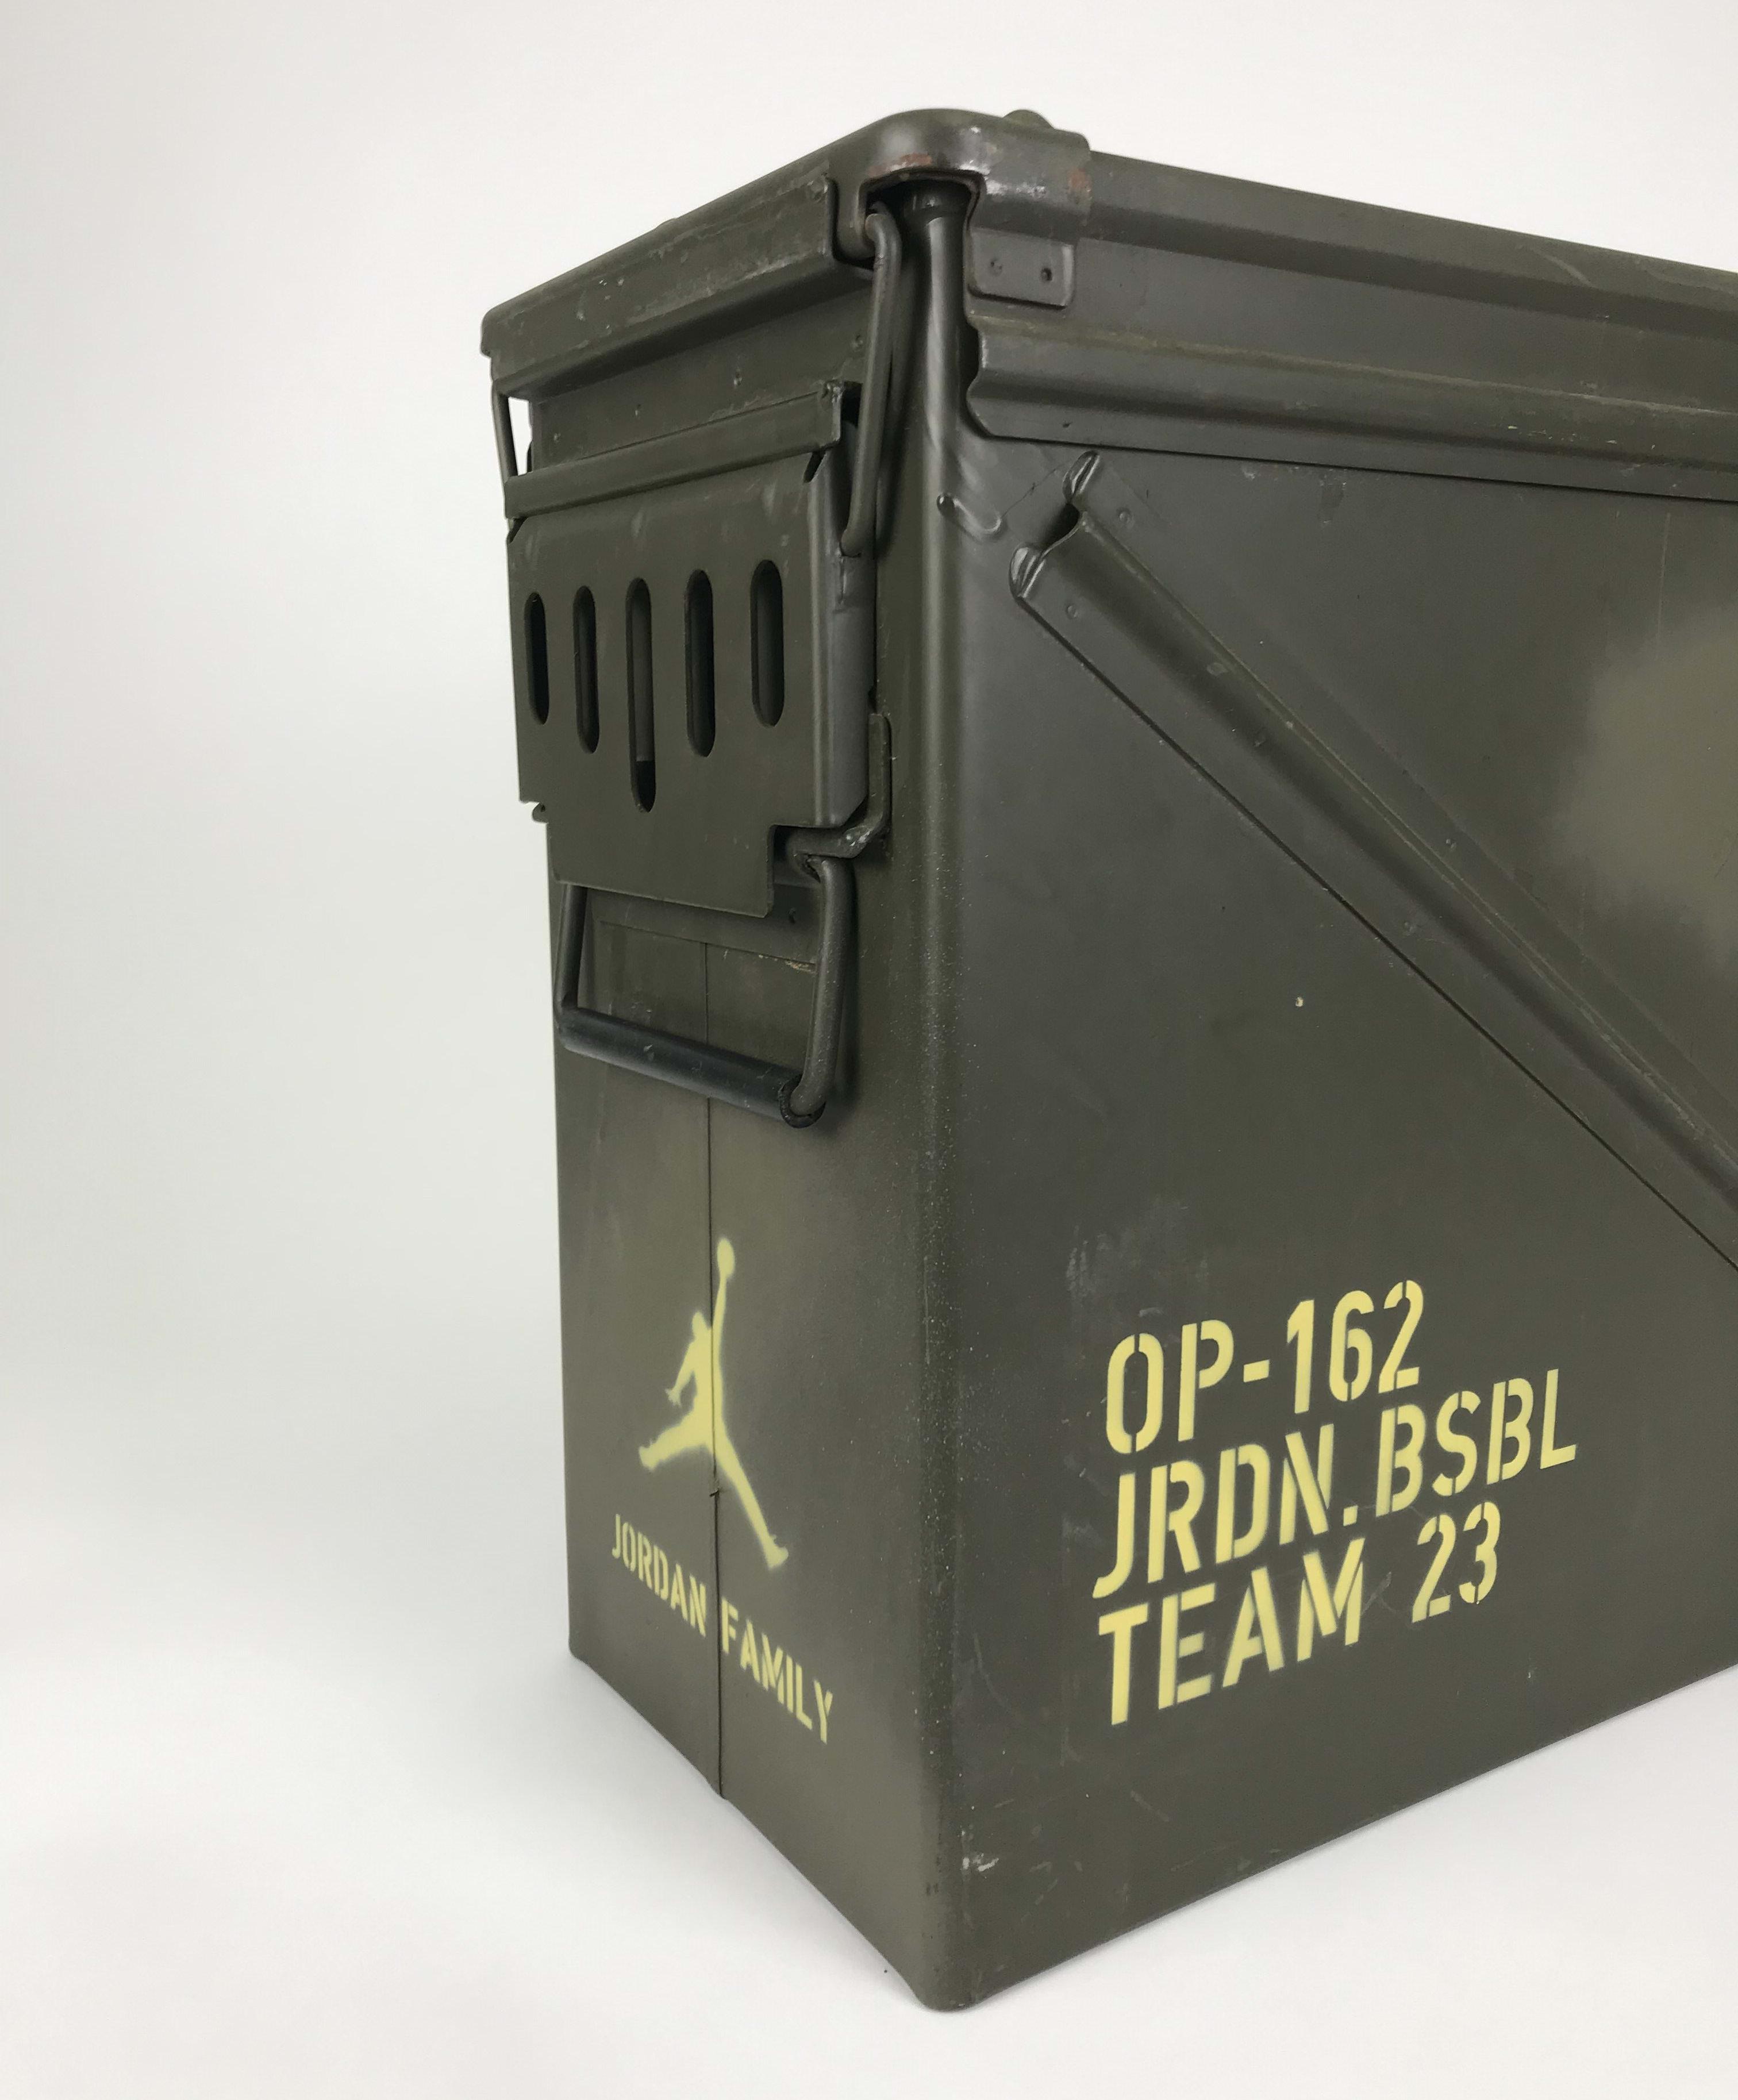 Air Jordan 6 Canvas MLB Pack Case Detail